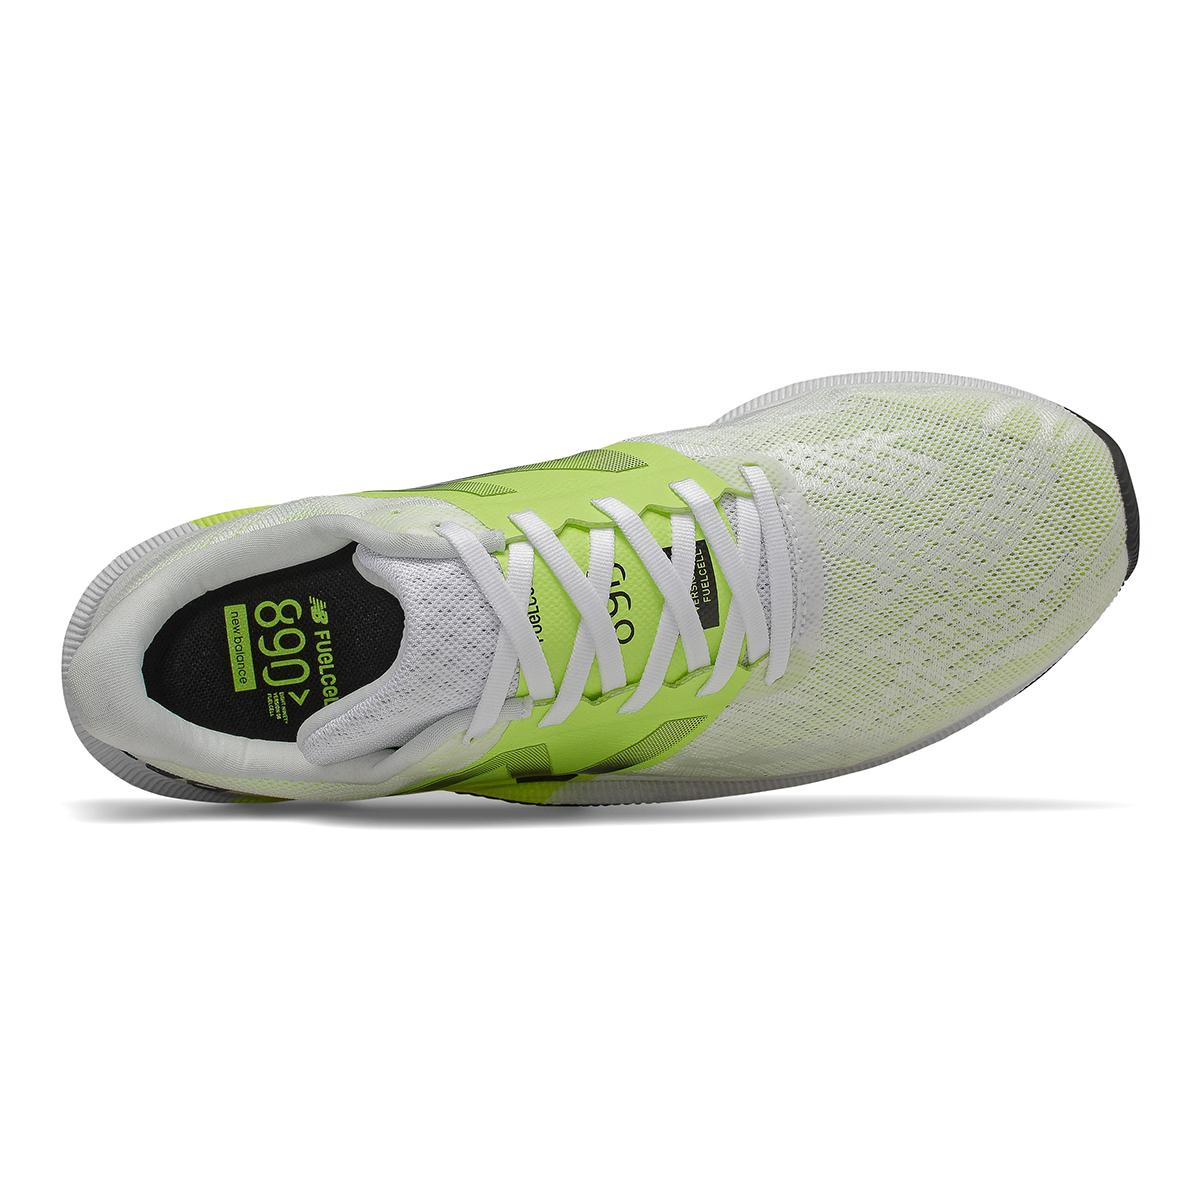 Men's New Balance 890V8 Running Shoe - Color: White (Wide Width) - Size: 7, White, large, image 3